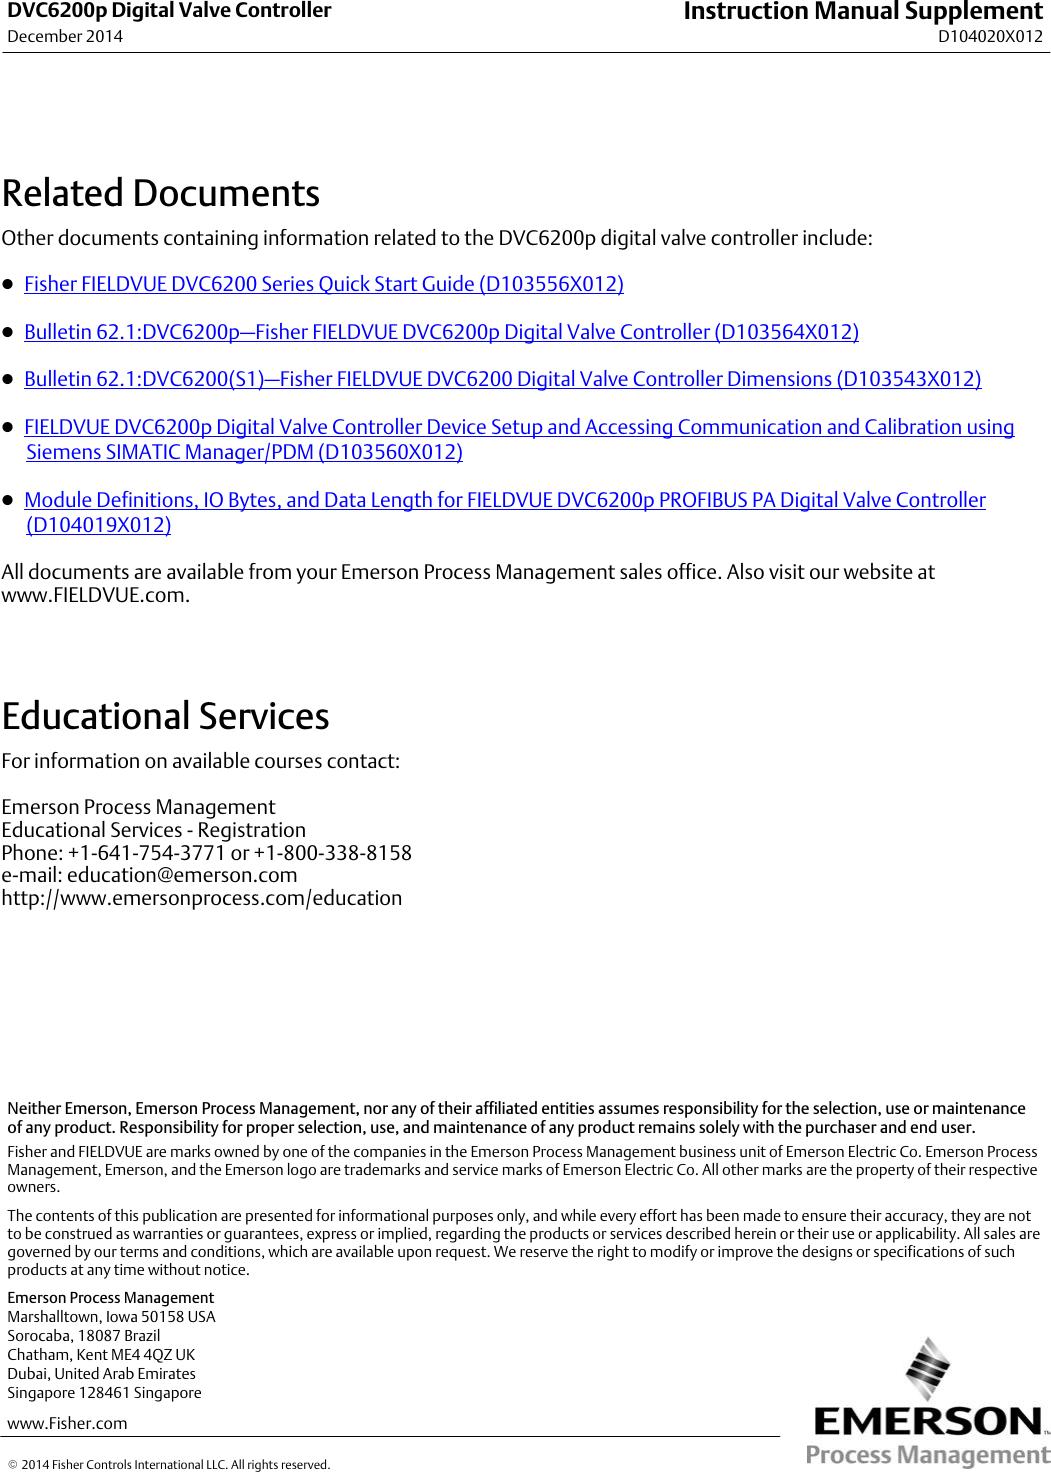 Emerson Fisher Fieldvuedvc6200P Digital Valve Controller Instruction